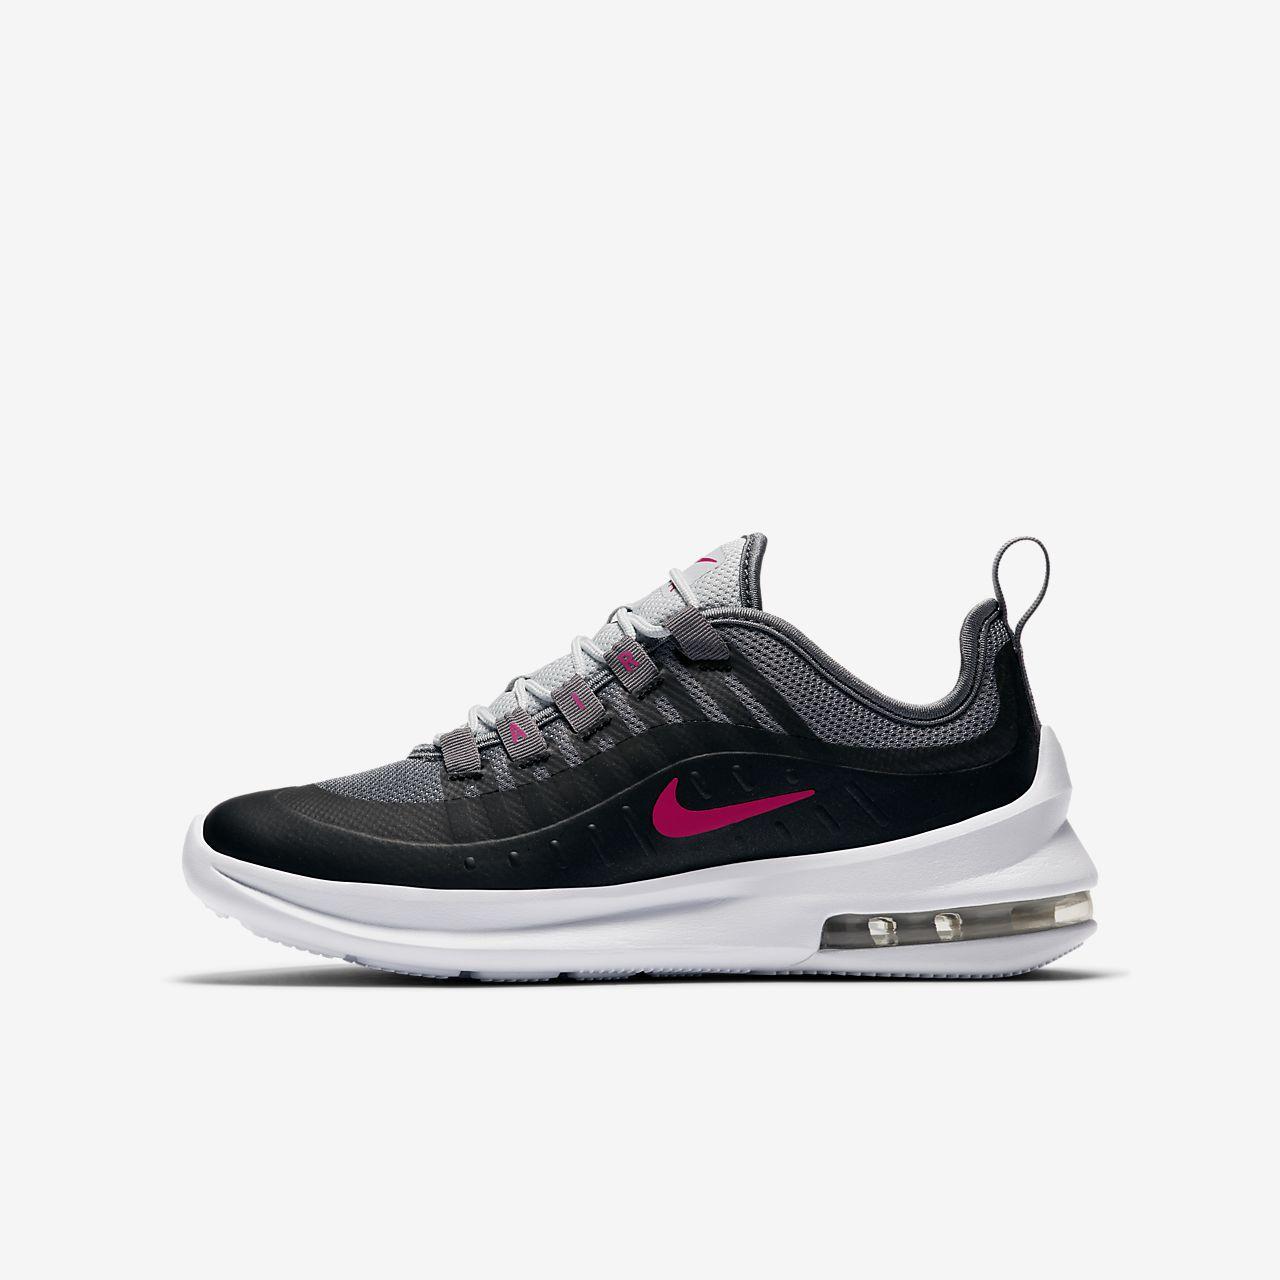 Gris Chaussures De Sport Nike Axe Air Max sncUYMVSd9